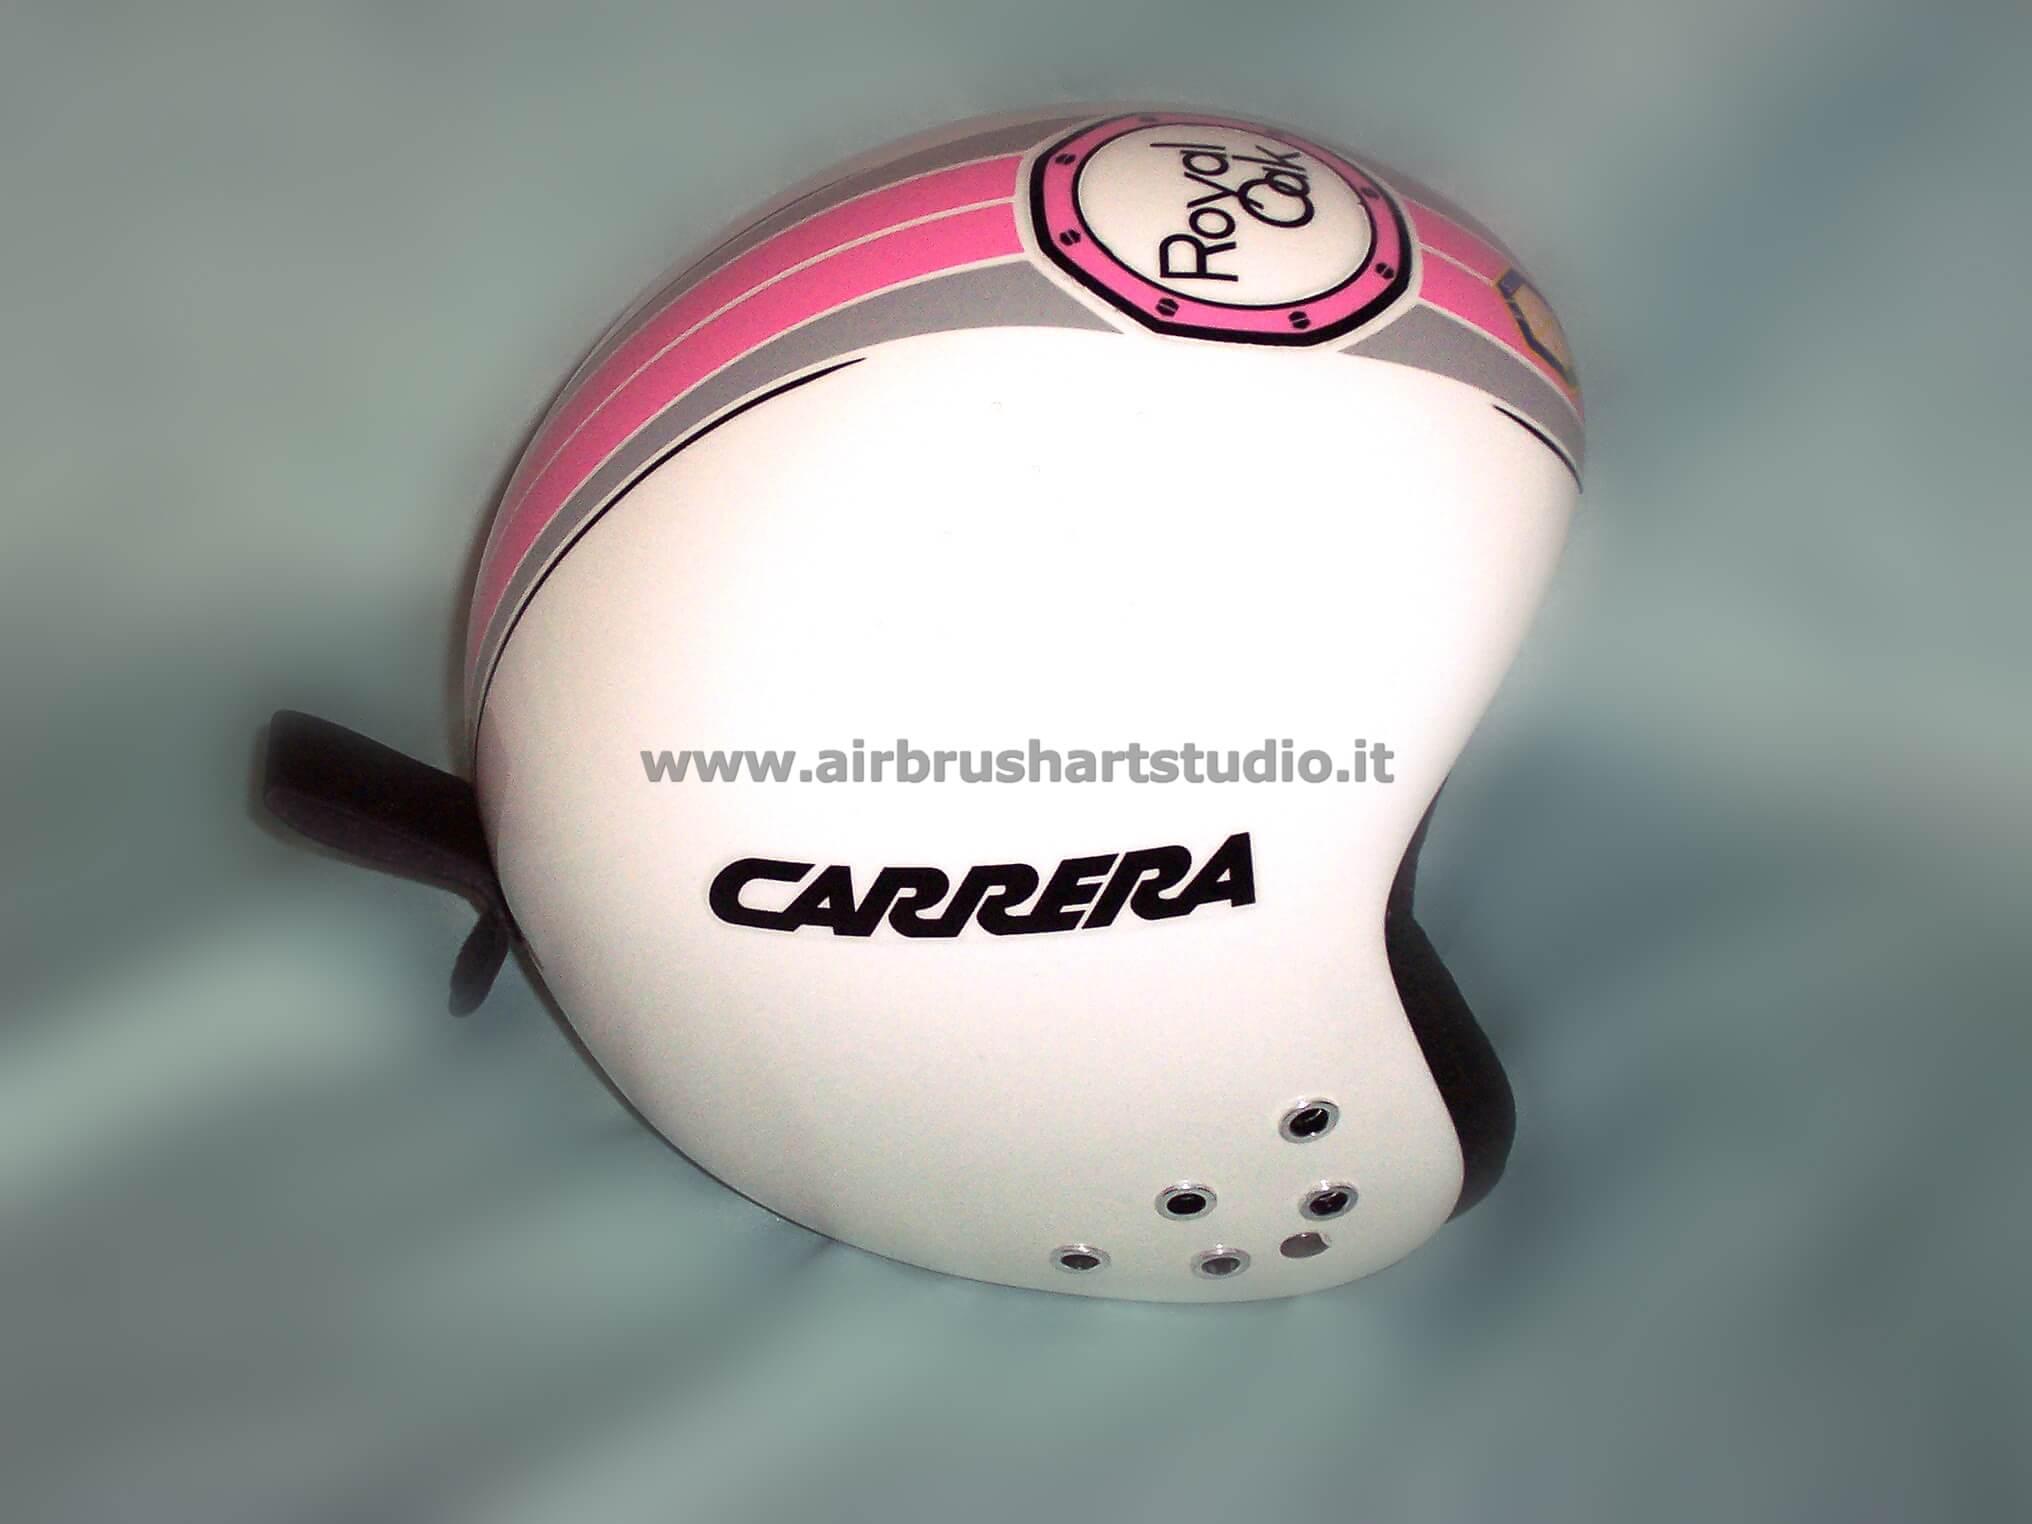 airbrushartstudio-it_aerografie_padova_italy_manuelamoelgg_mondialiscibormio2008